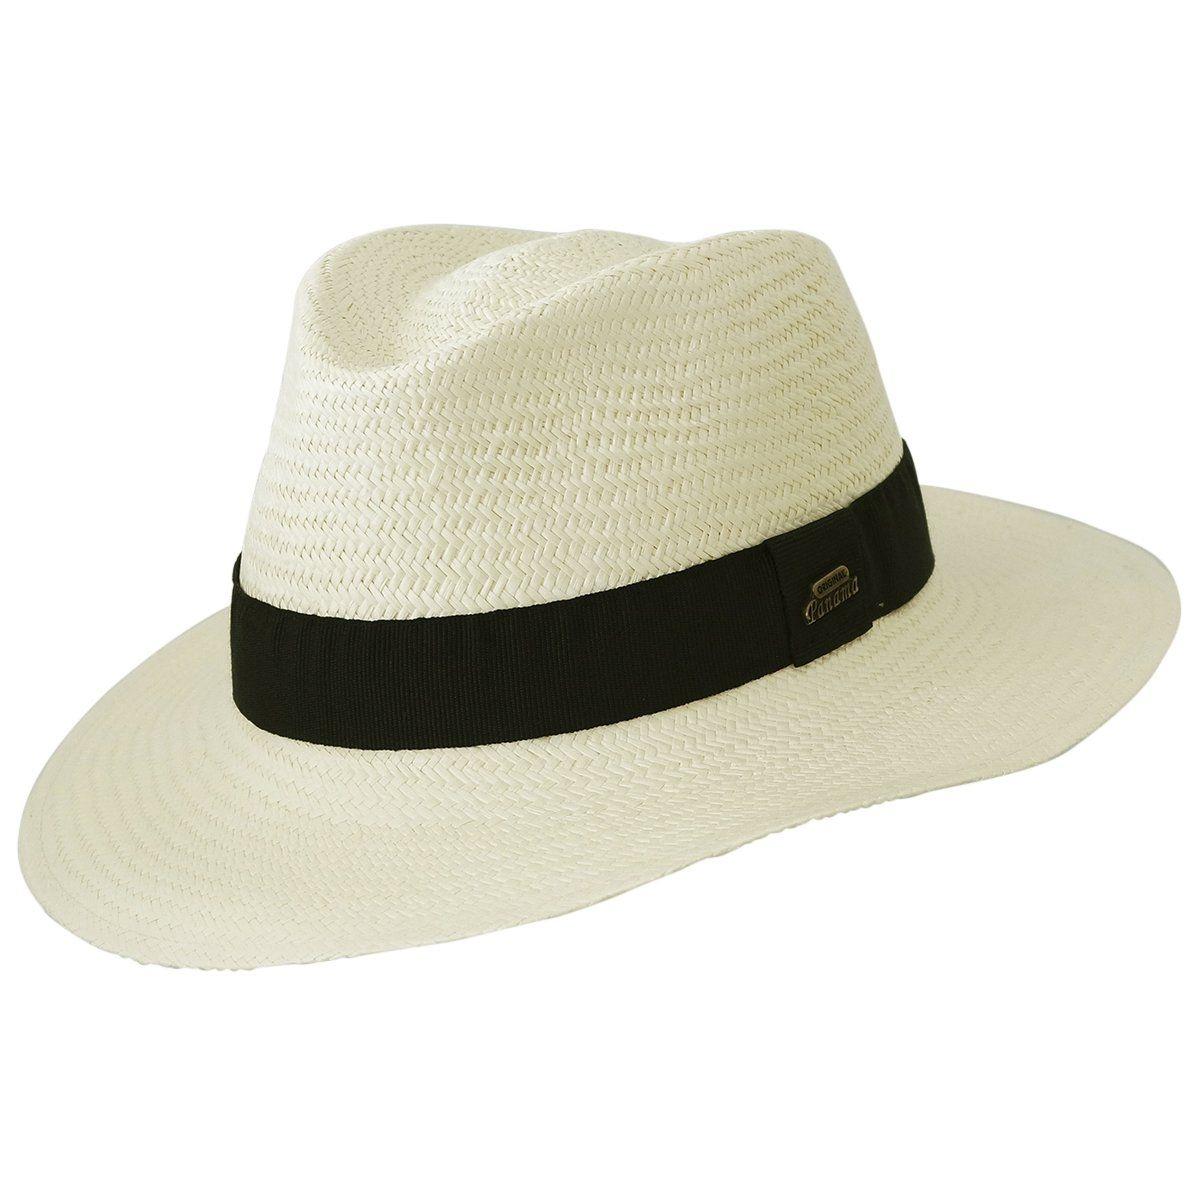 Véritable chapeau panama naturel